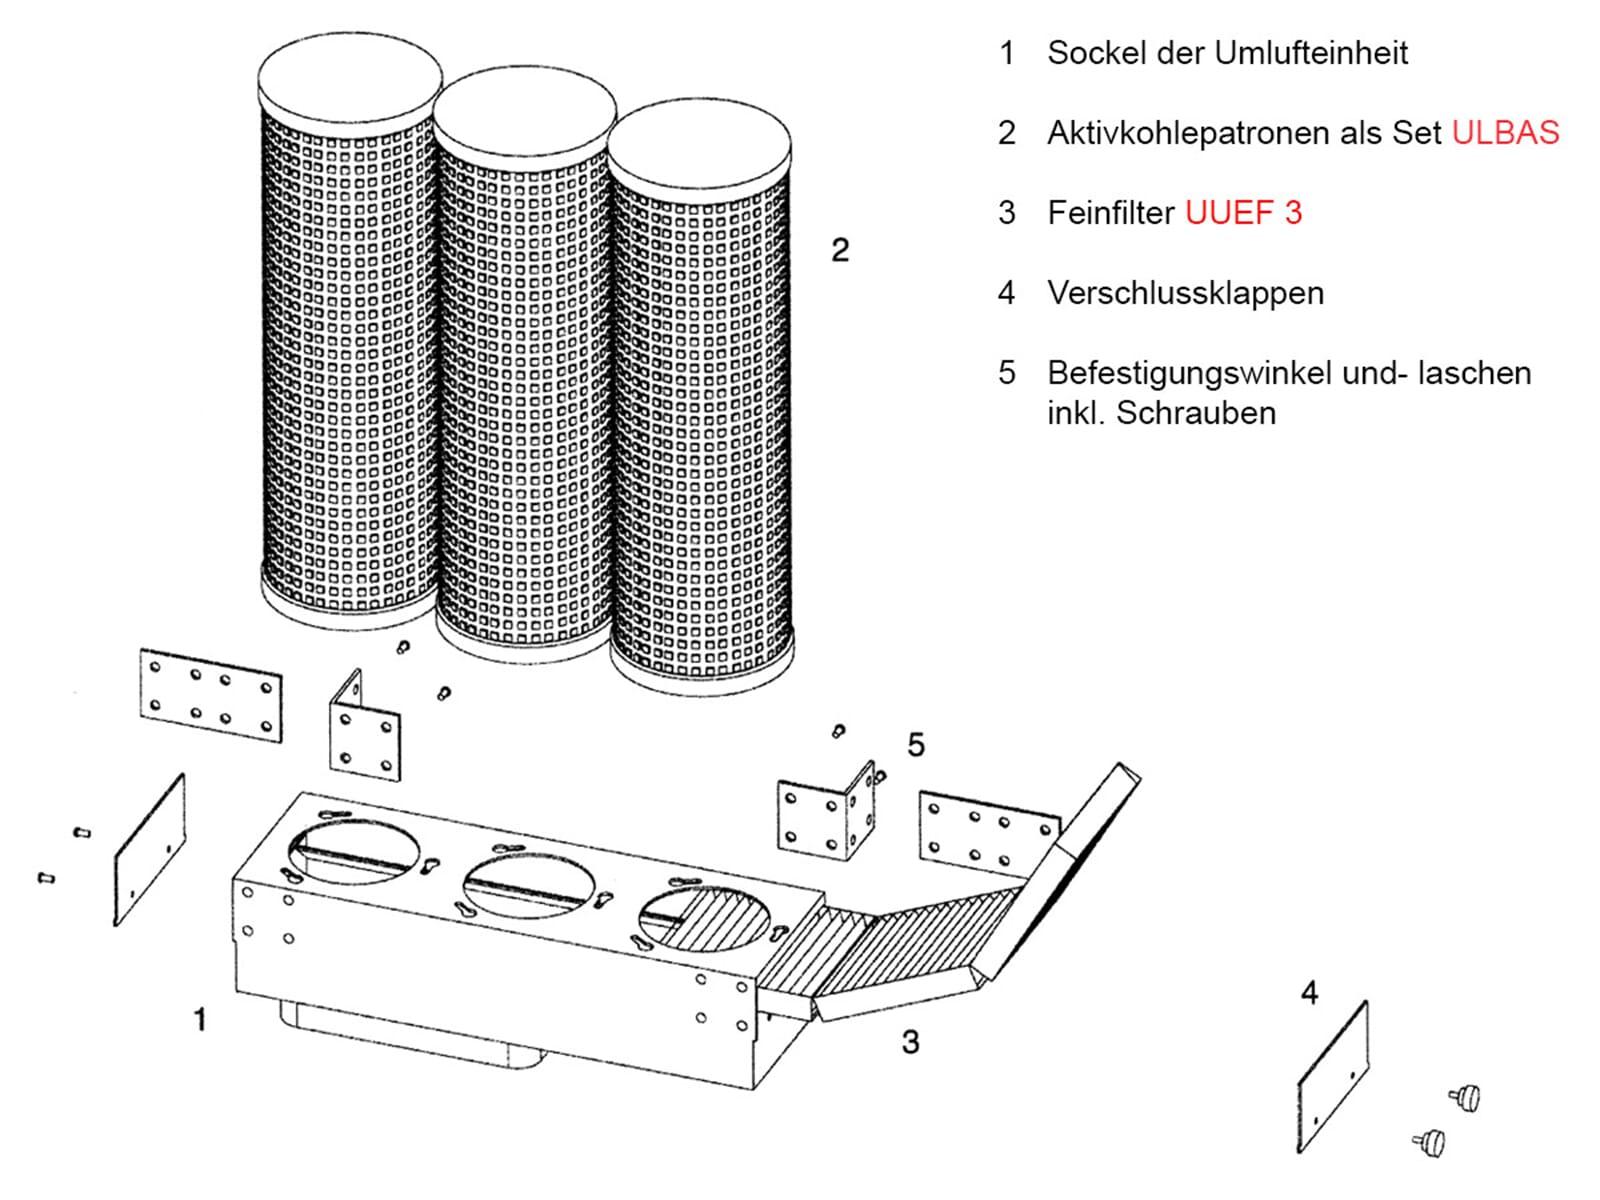 Bora Aktivkohlefilterpatronen-Set UUEAPS 0